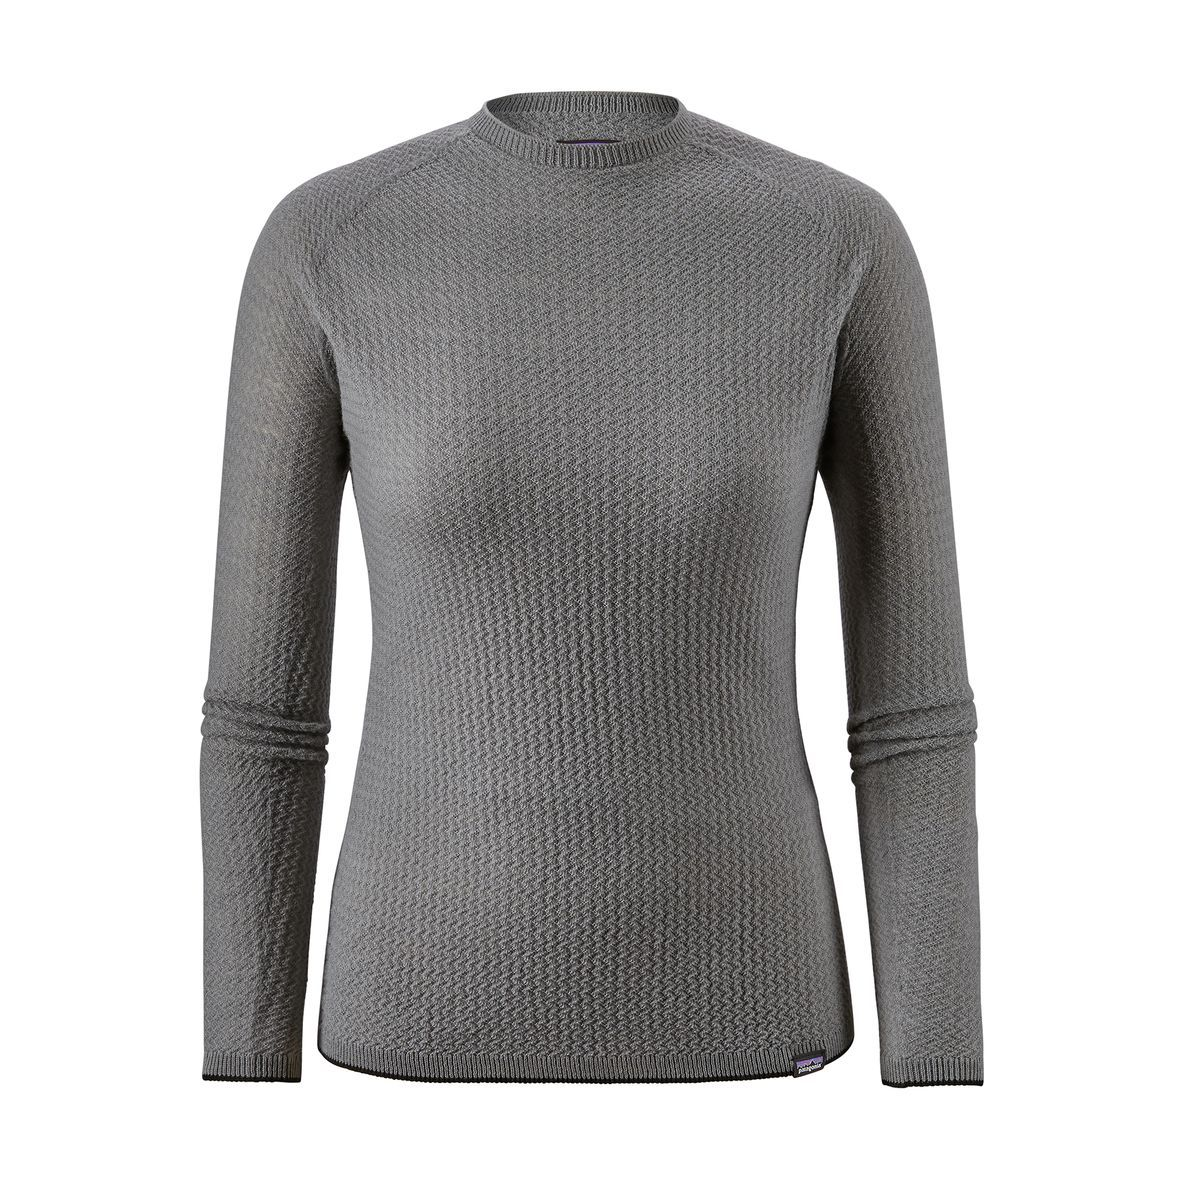 Women's Capilene® Air Crew Outdoor outfit, Crew neck